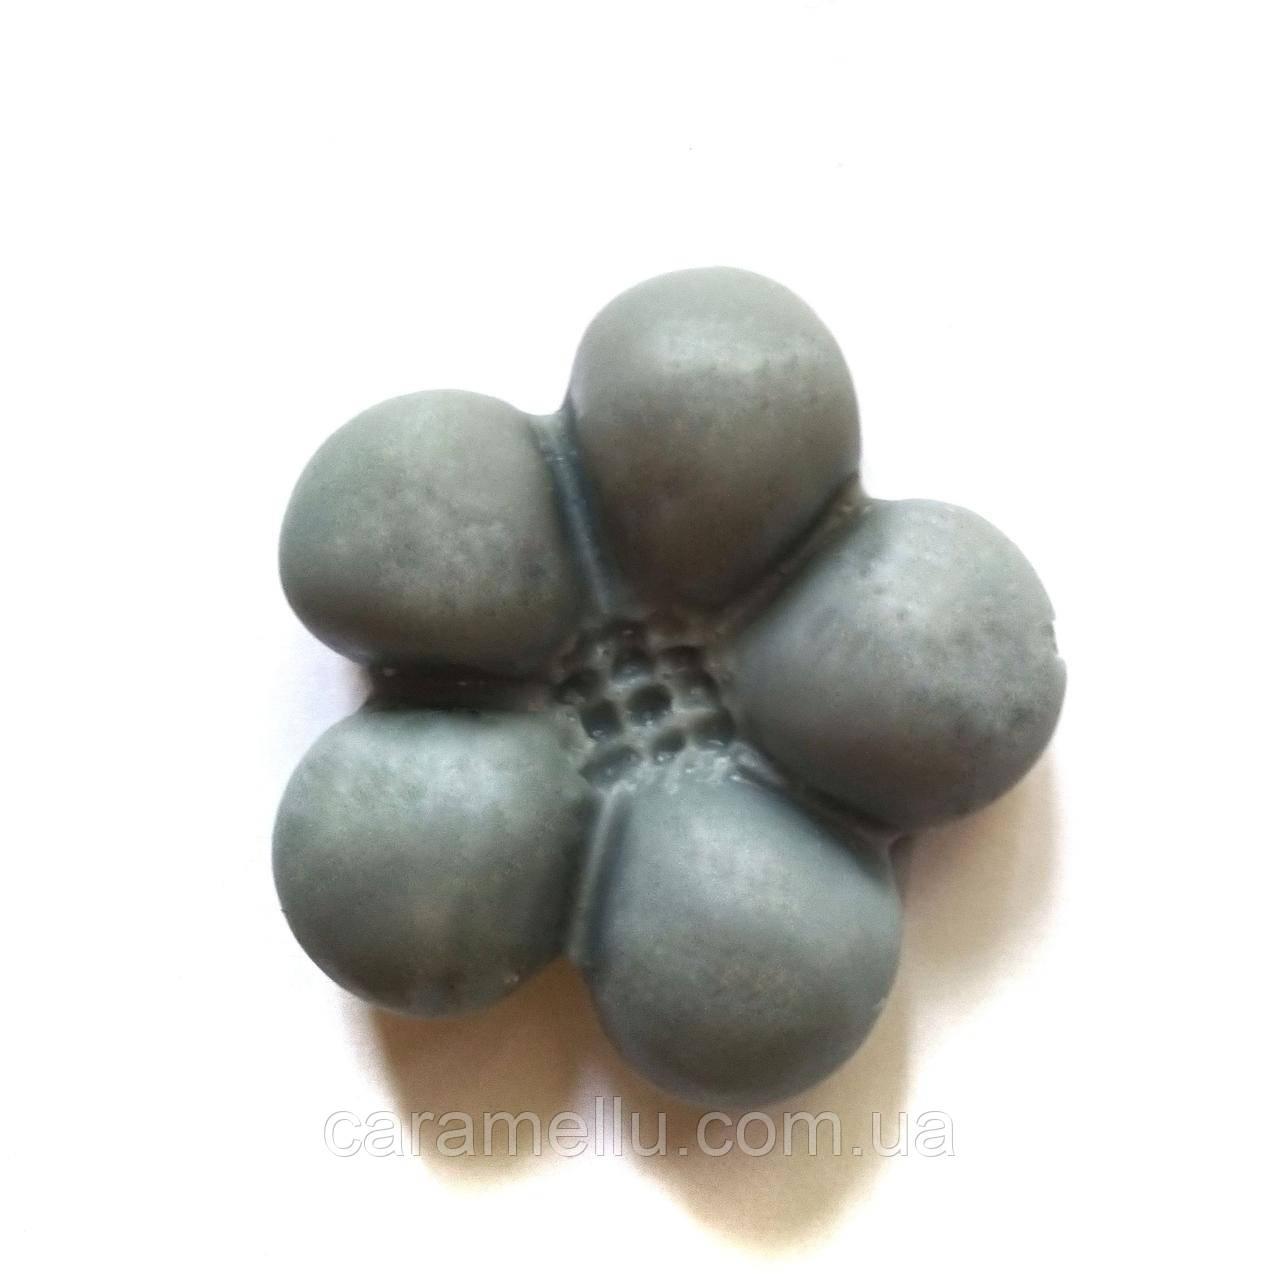 Молд Пятилистник 4,5х4,5 см